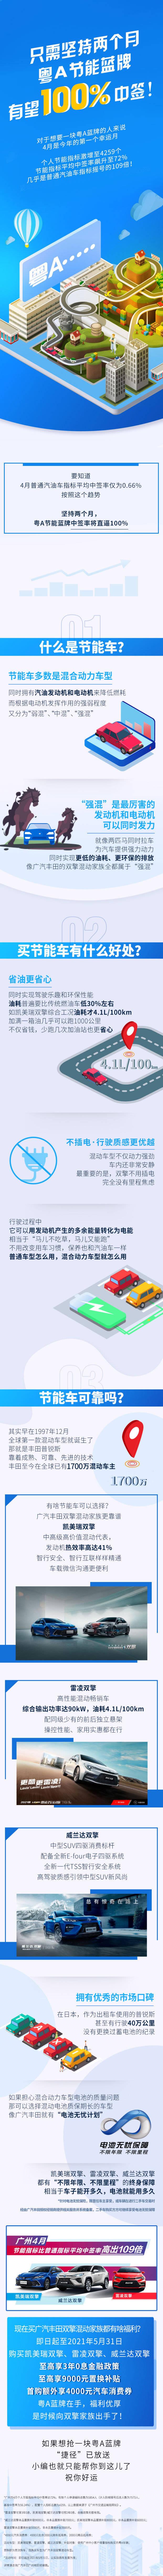 沐鸣3代理开户-首页【1.1.0】